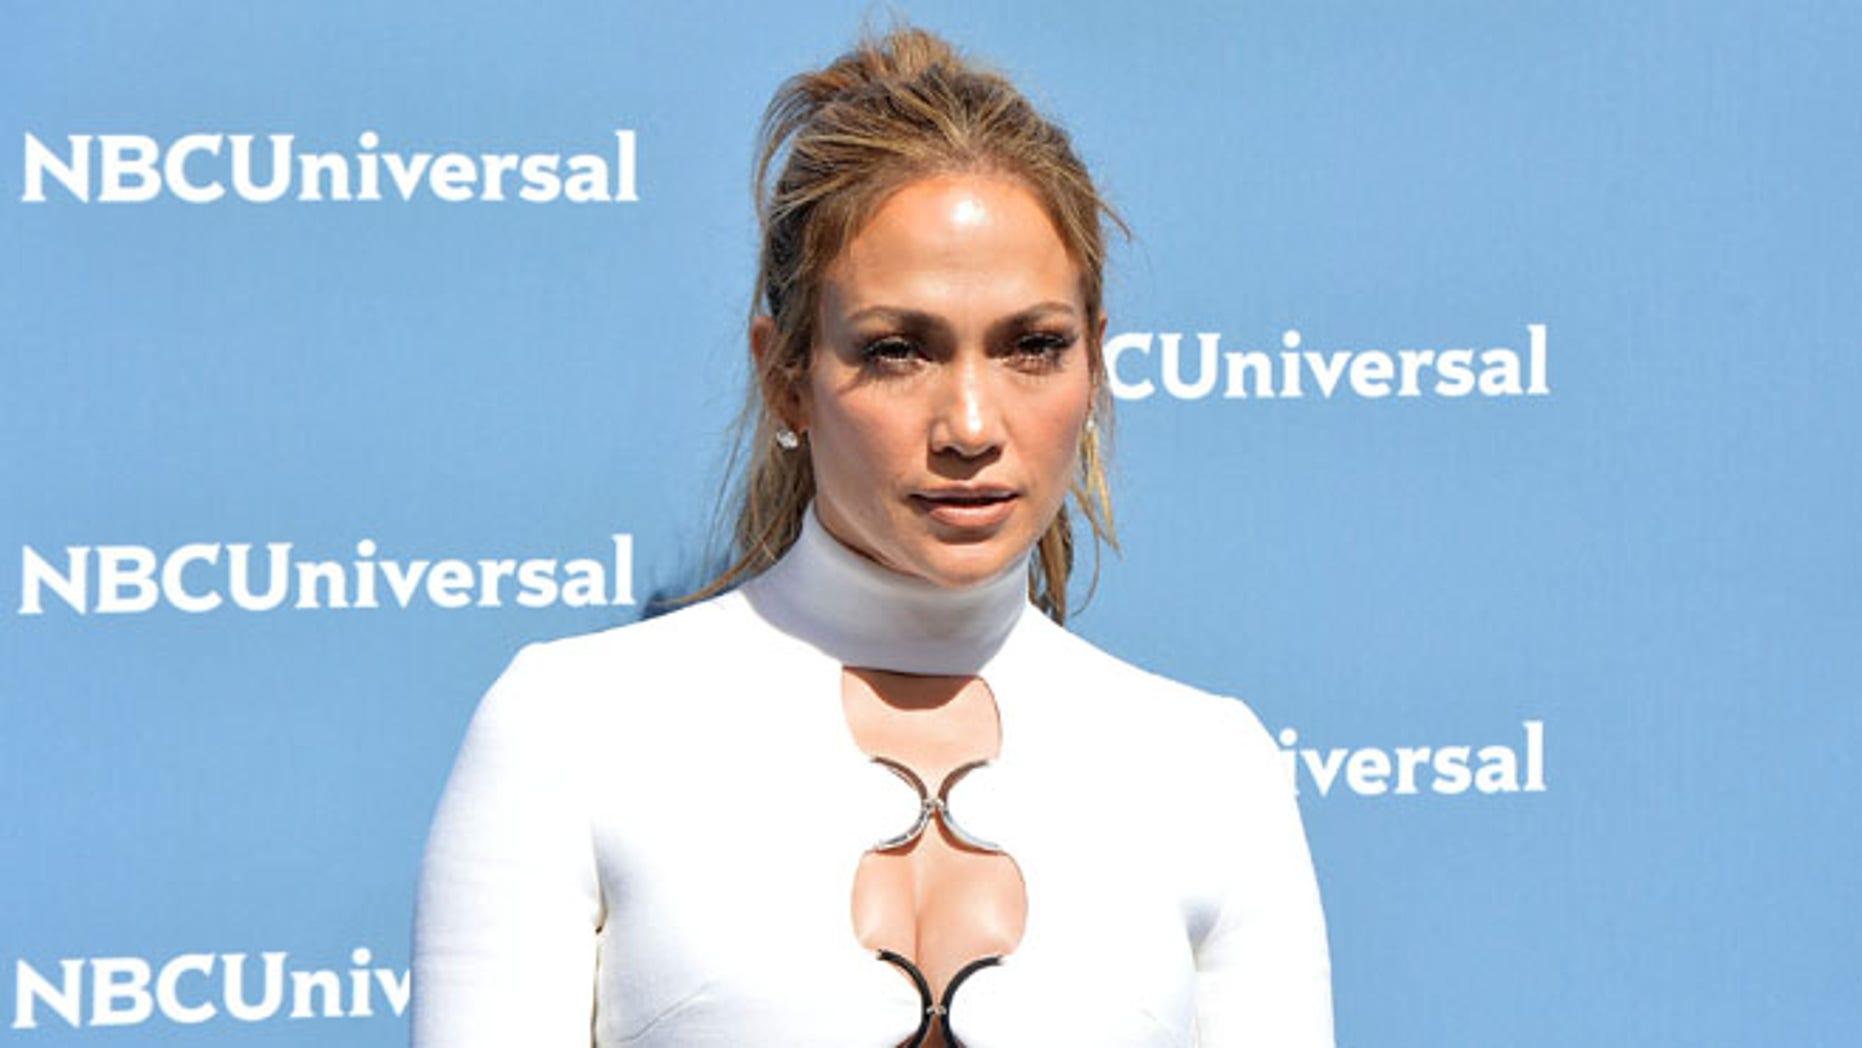 Jennifer Lopez on May 16, 2016 in New York.